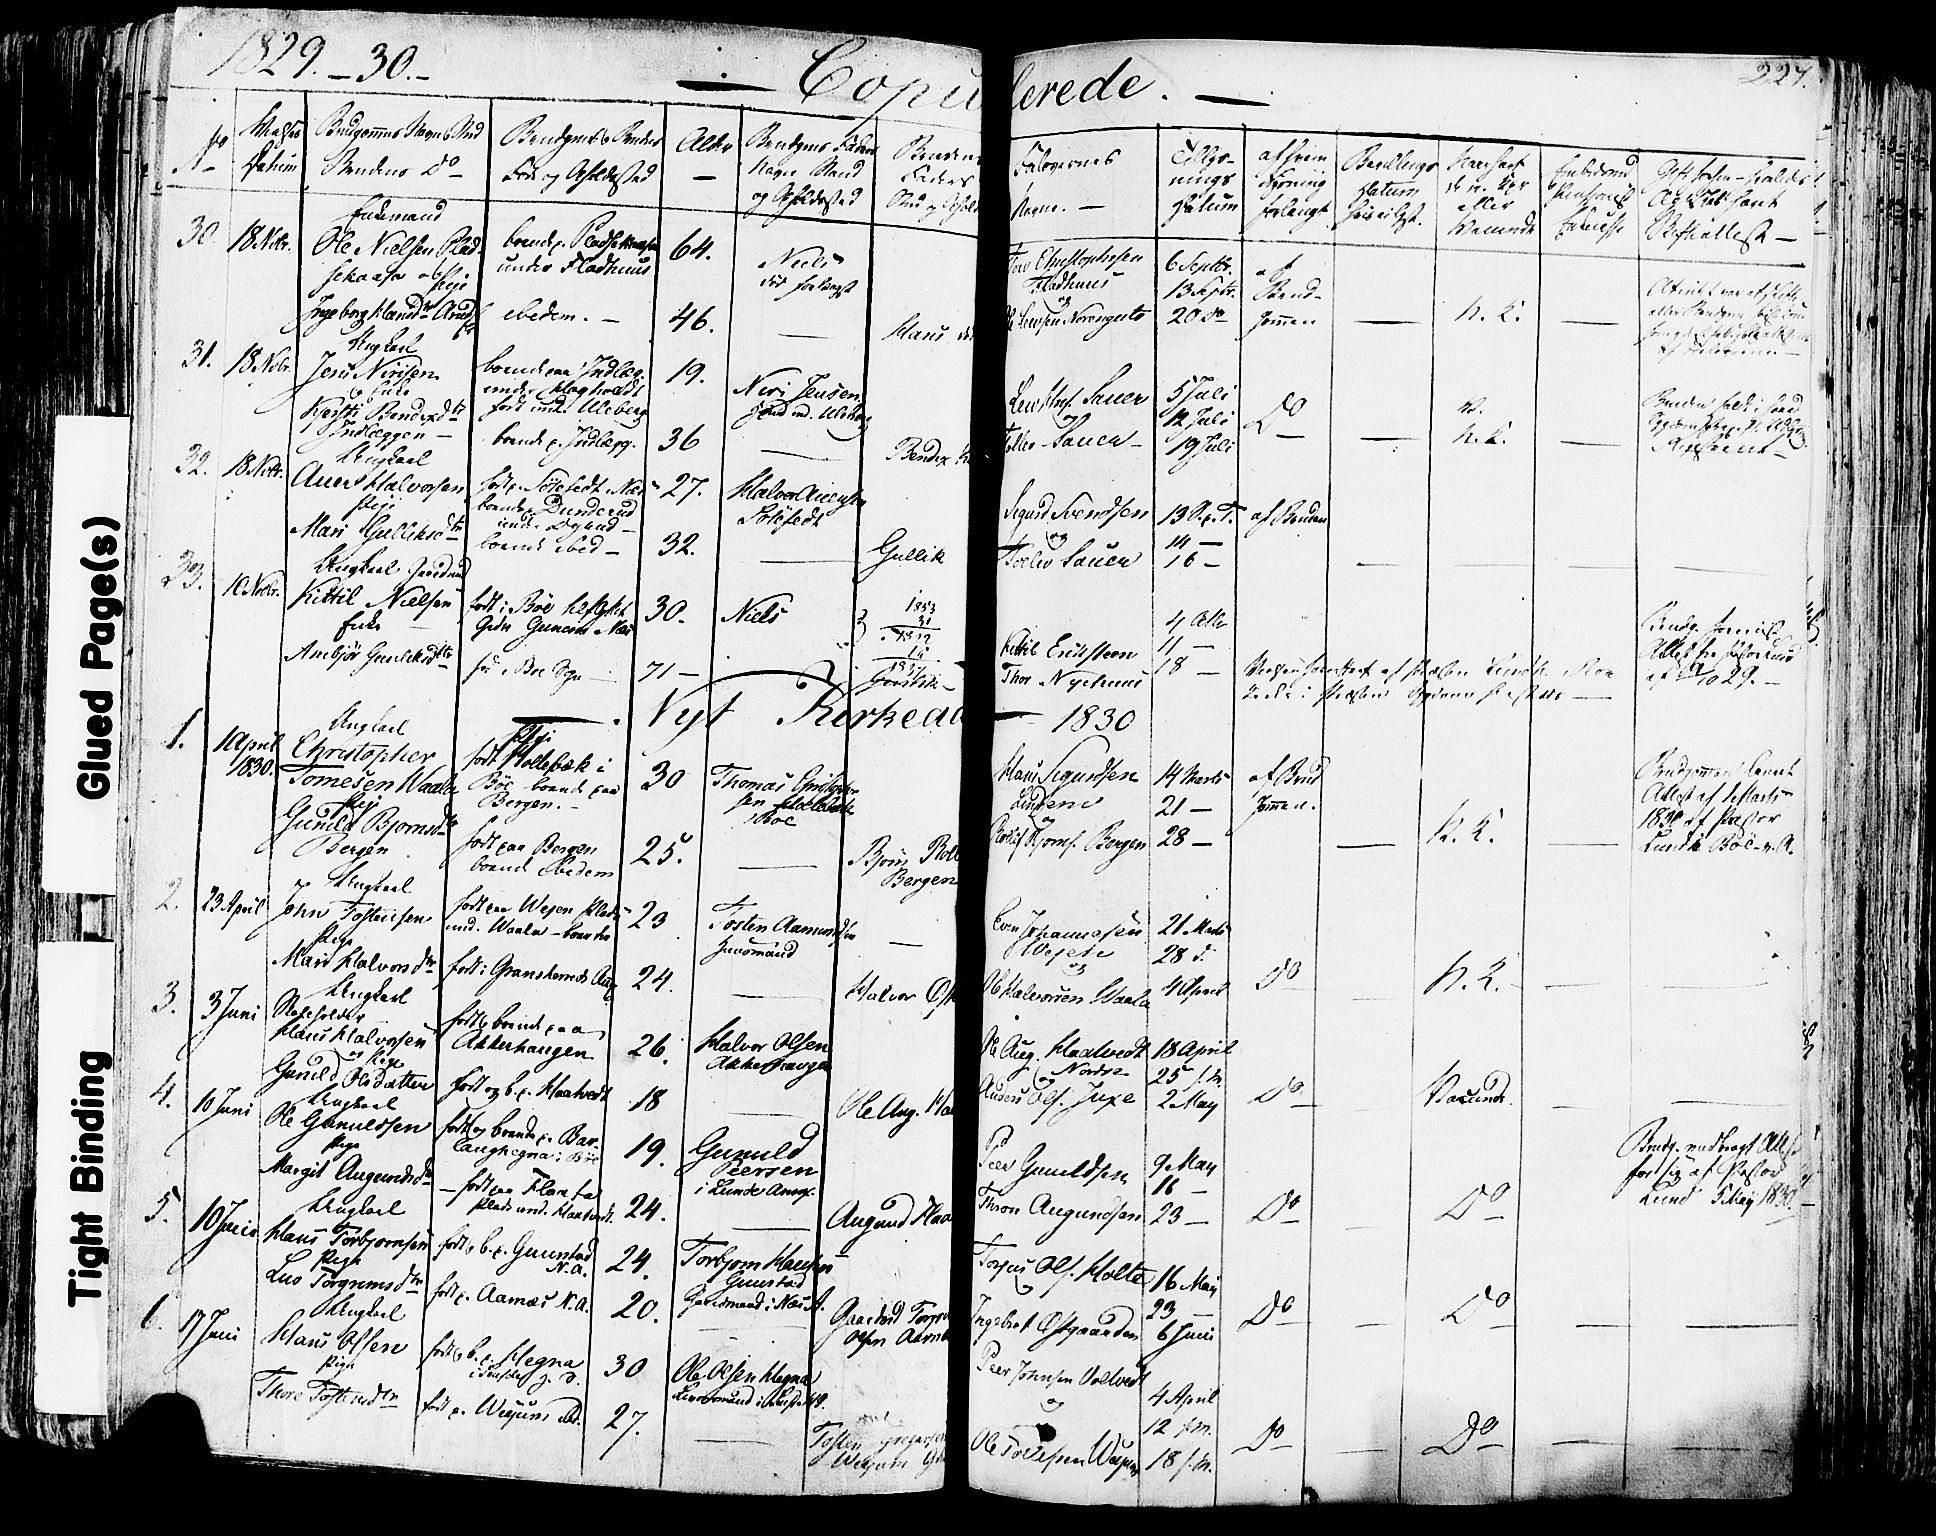 SAKO, Sauherad kirkebøker, F/Fa/L0006: Ministerialbok nr. I 6, 1827-1850, s. 227